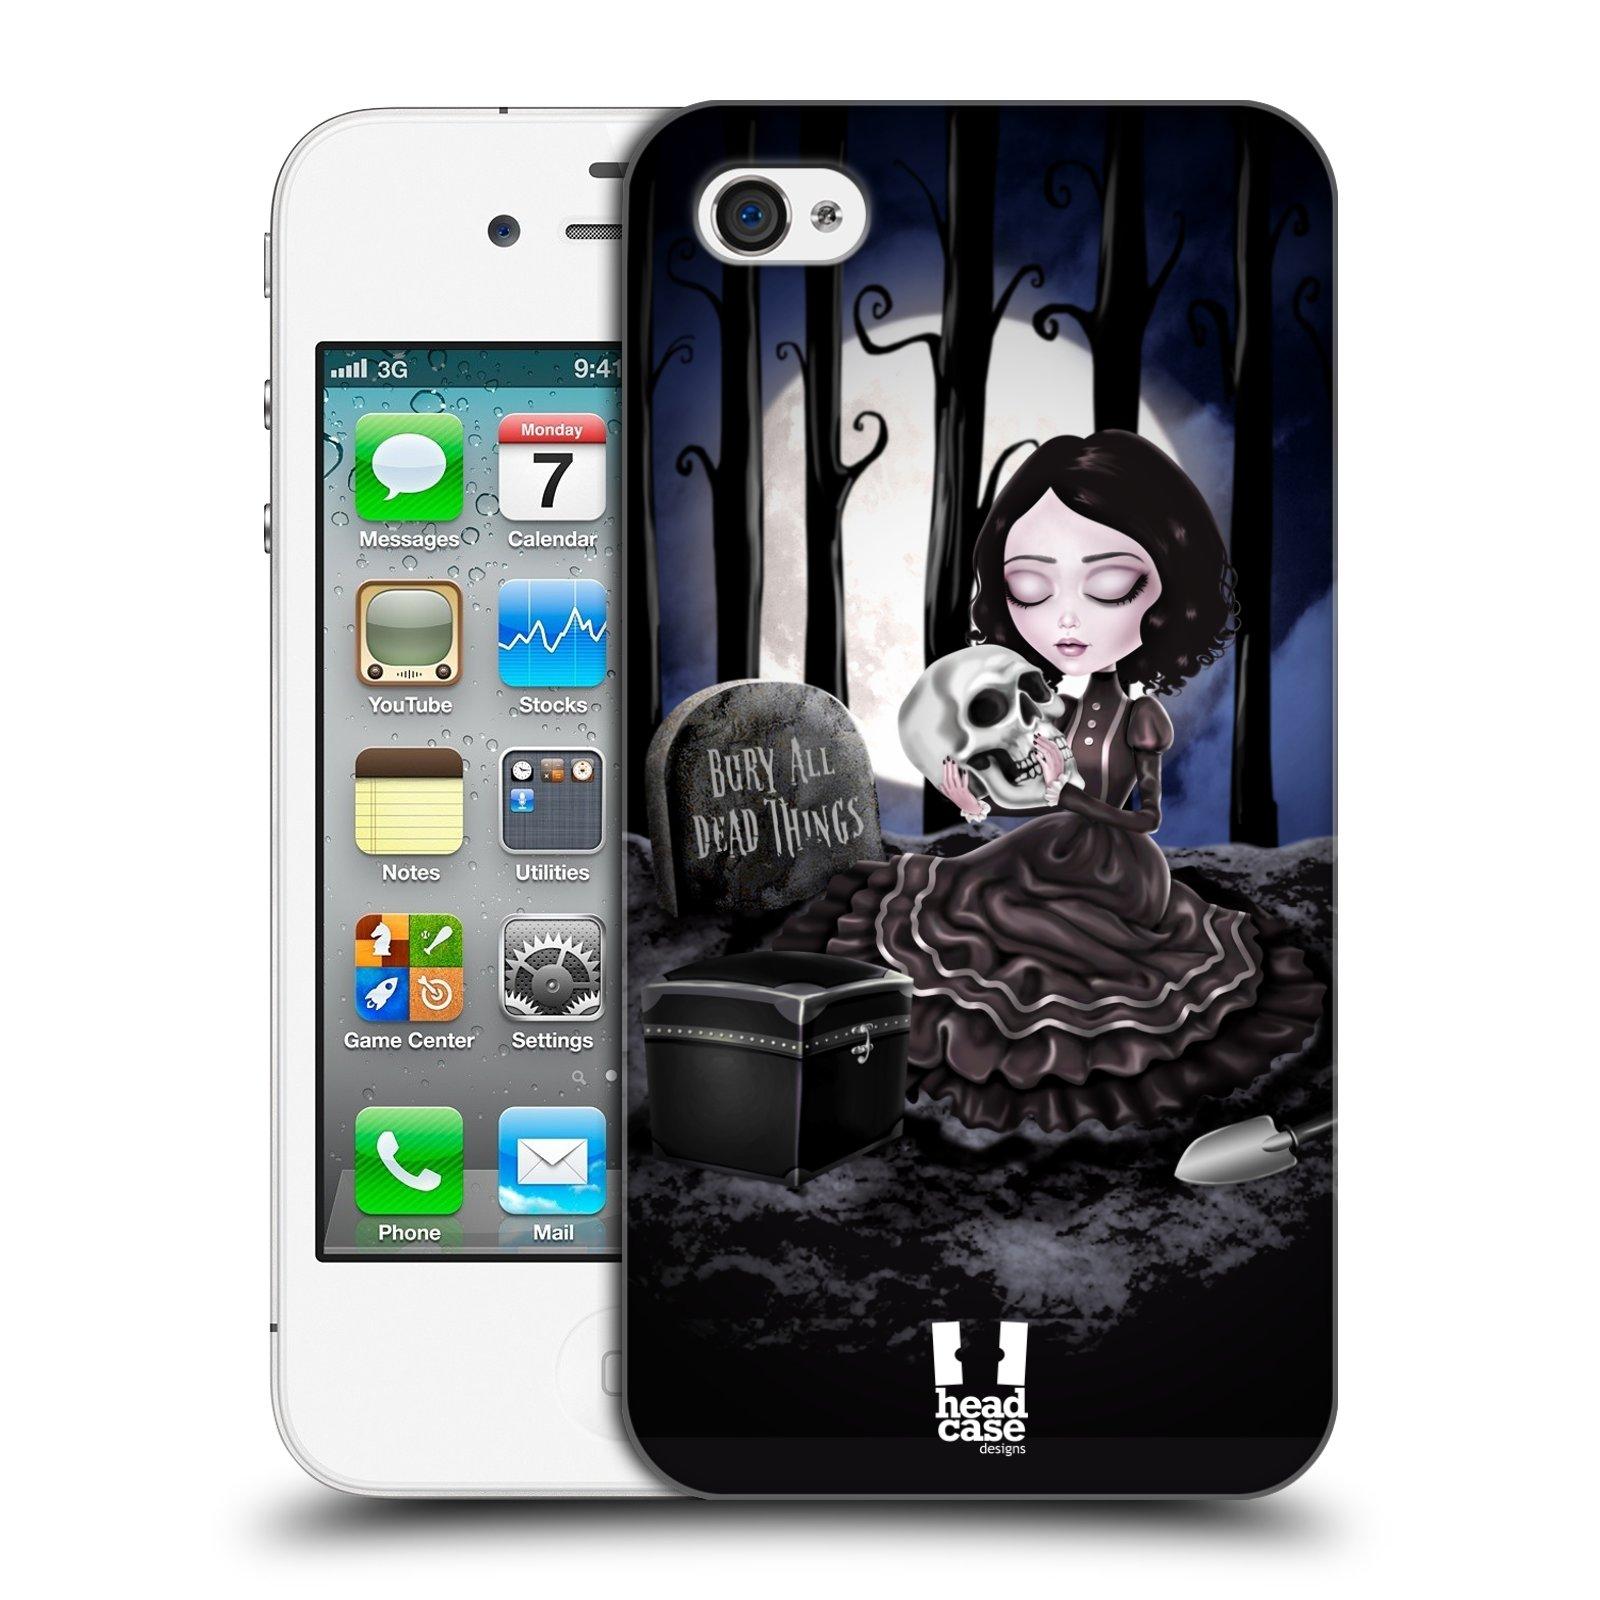 Plastové pouzdro na mobil Apple iPhone 4 a 4S HEAD CASE MACABRE HŘBITOV